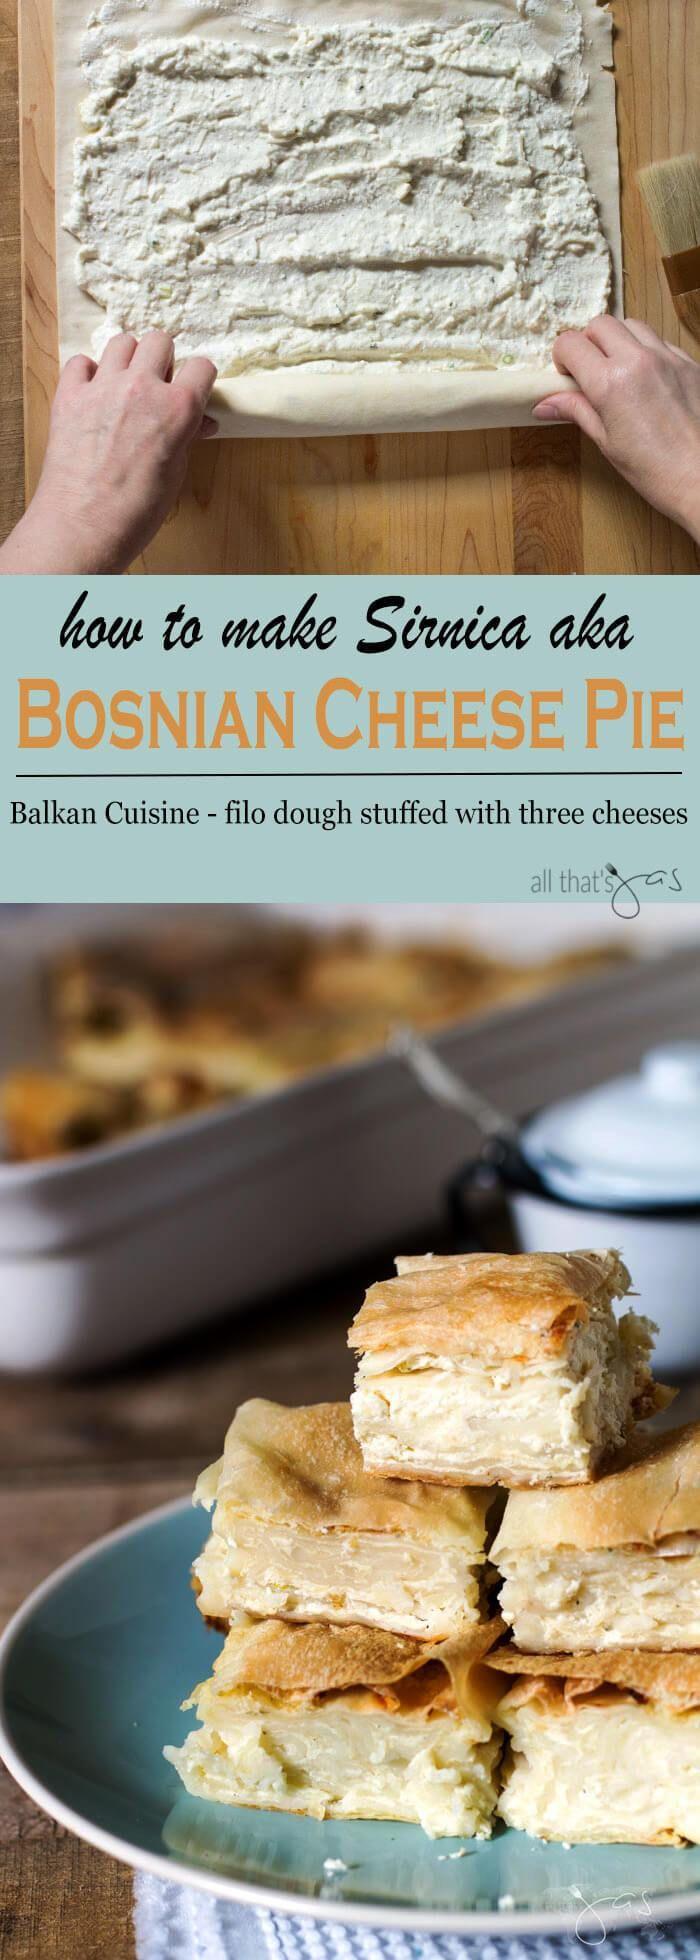 The 25 best bosnian pita recipe ideas on pinterest serbian food bosnian cheese pie pita sirnica yummy dinner recipeseasy forumfinder Choice Image